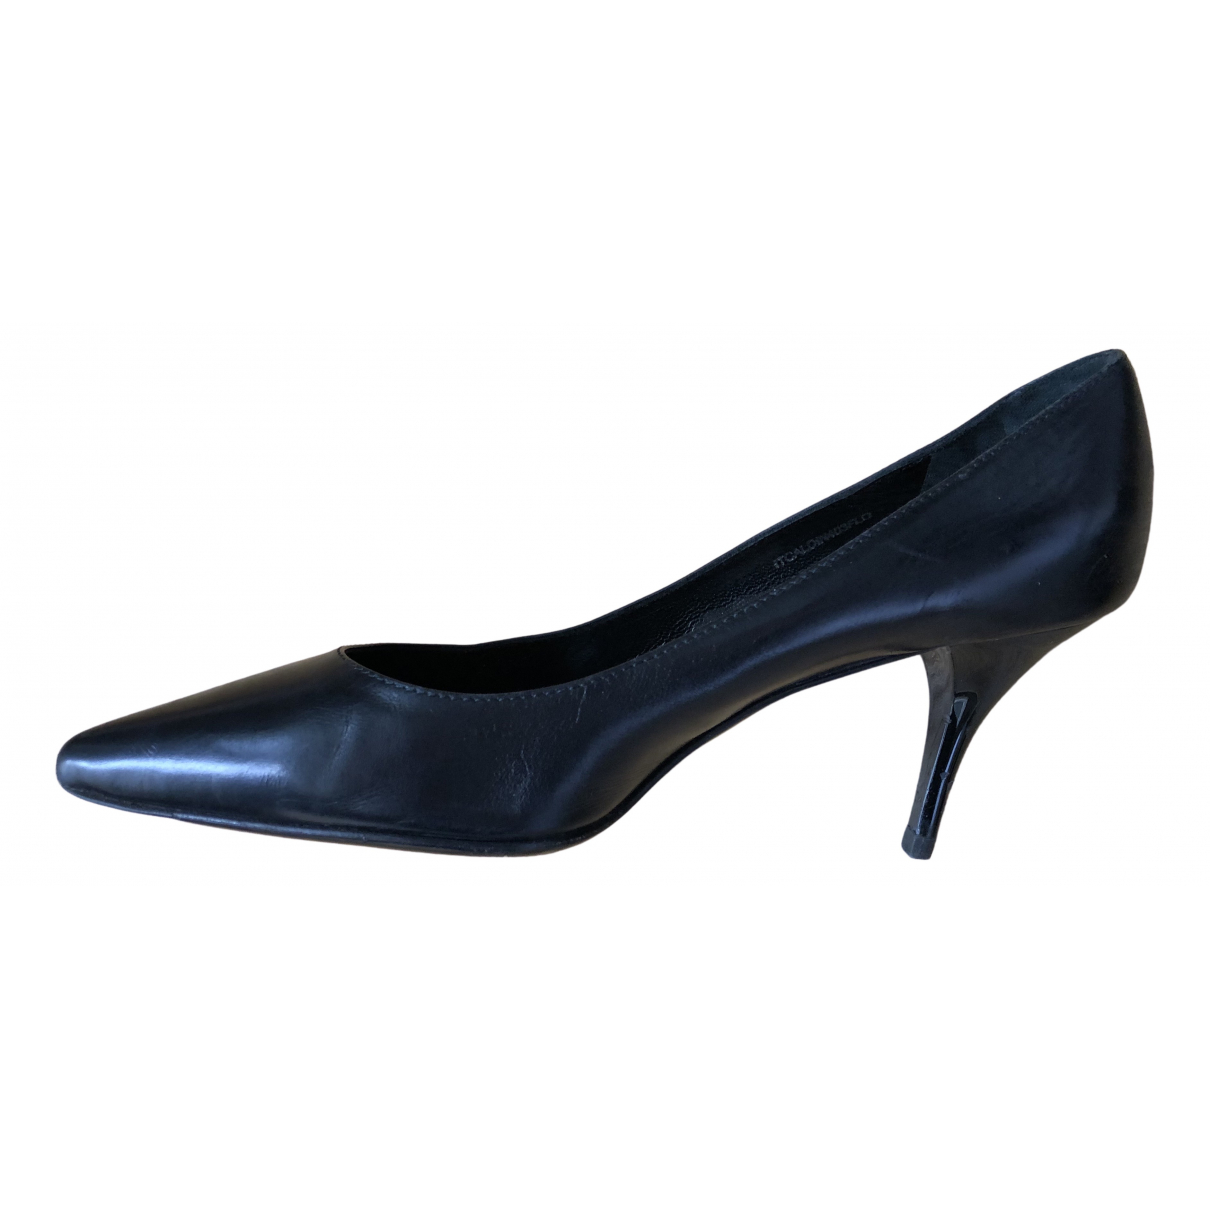 Burberry N Black Leather Heels for Women 38.5 EU